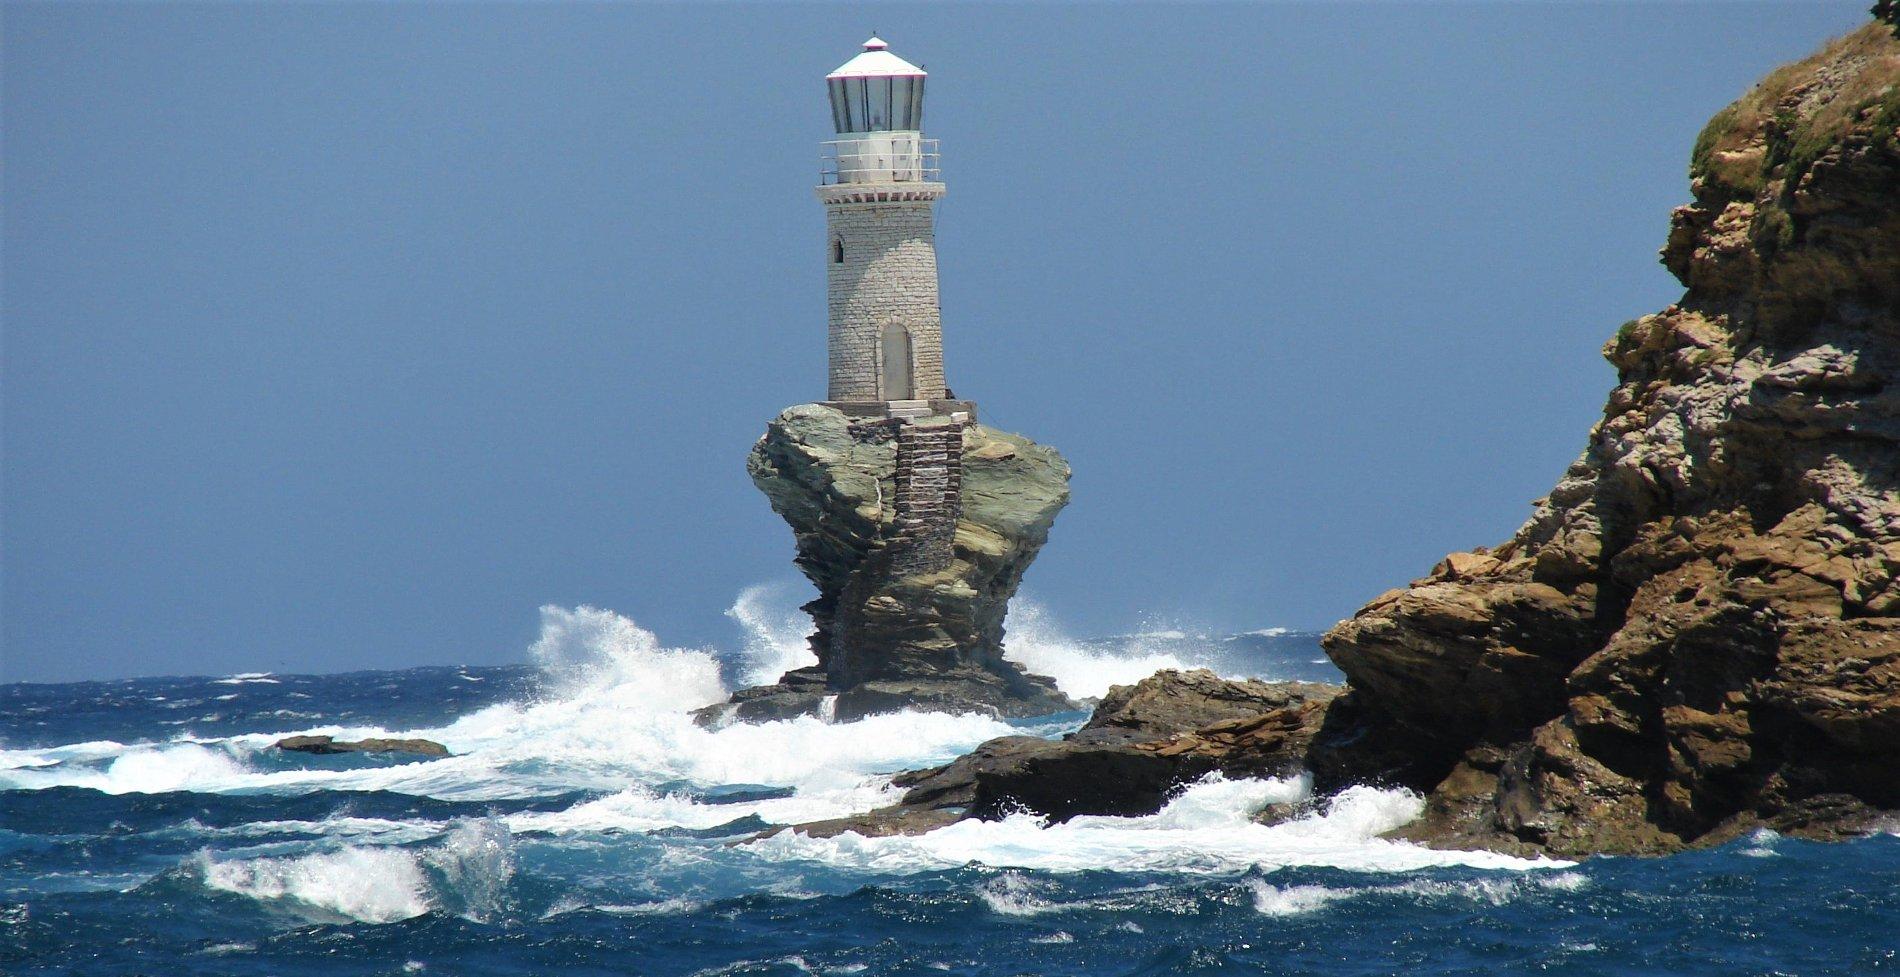 The impressive Tourlitis lighthouse of Andros island, Greece. Source: Alphacoders